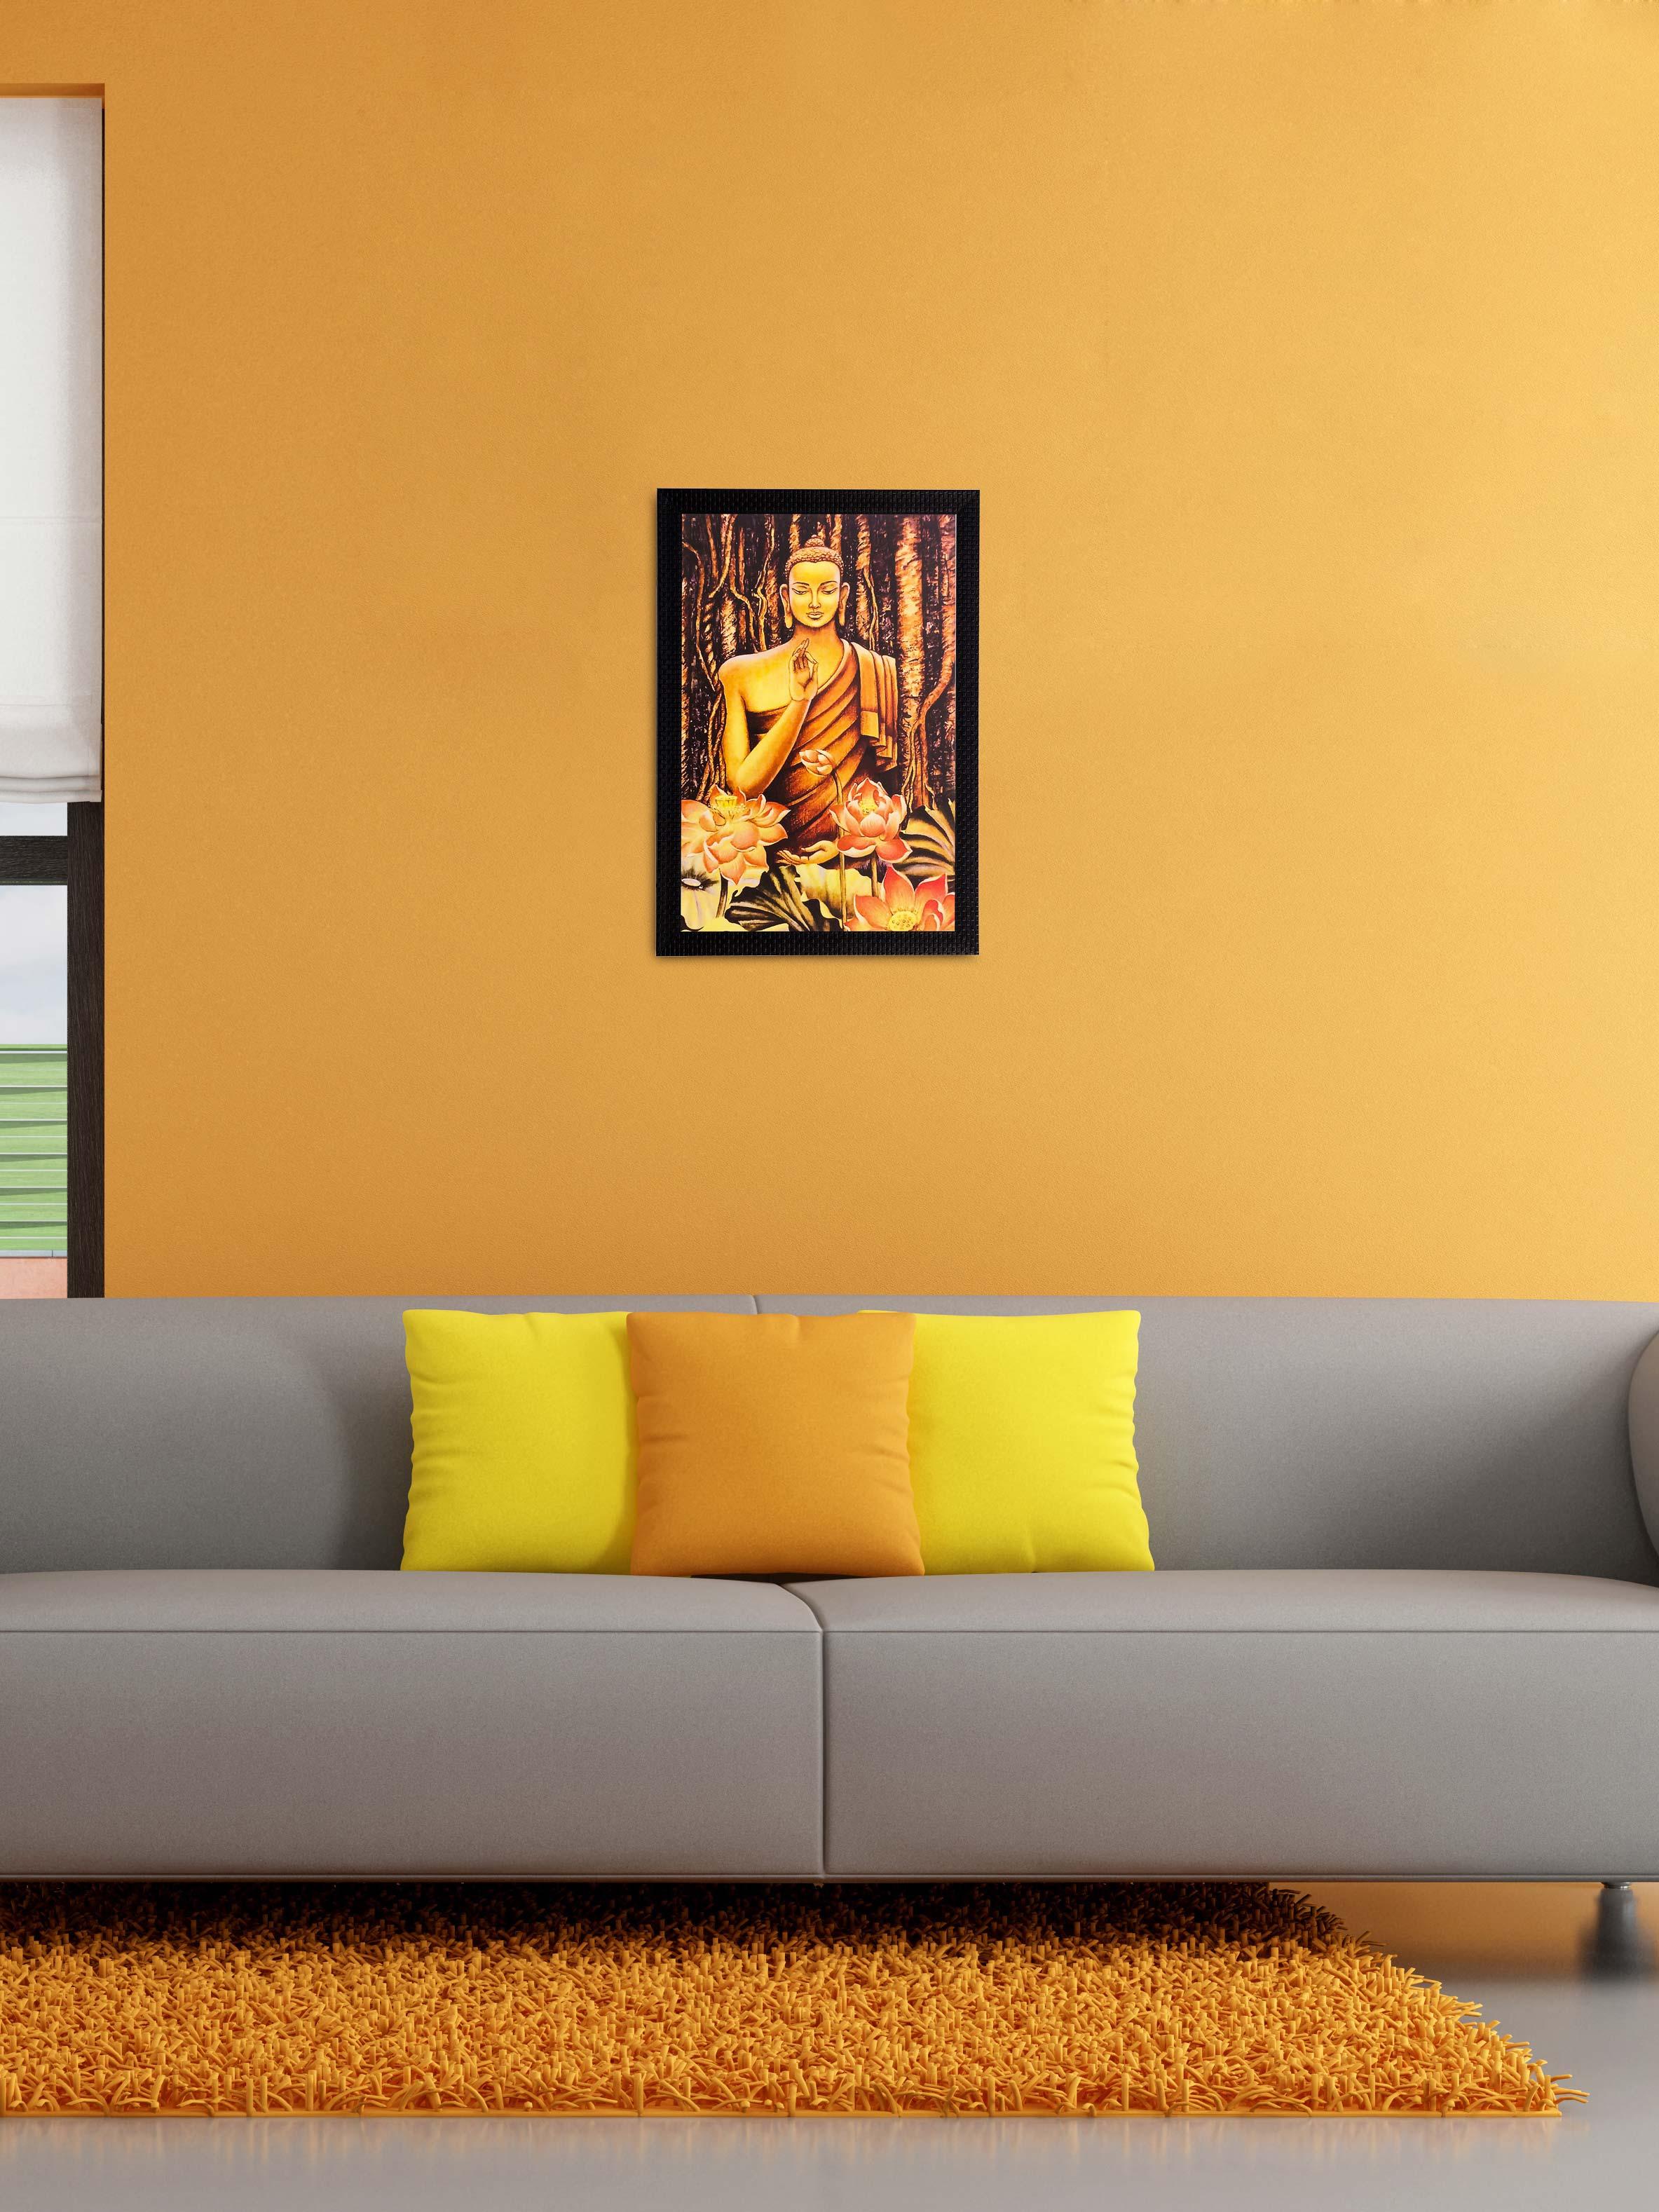 Cricket Ball Wall Art - Buy Cricket Ball Wall Art online in India